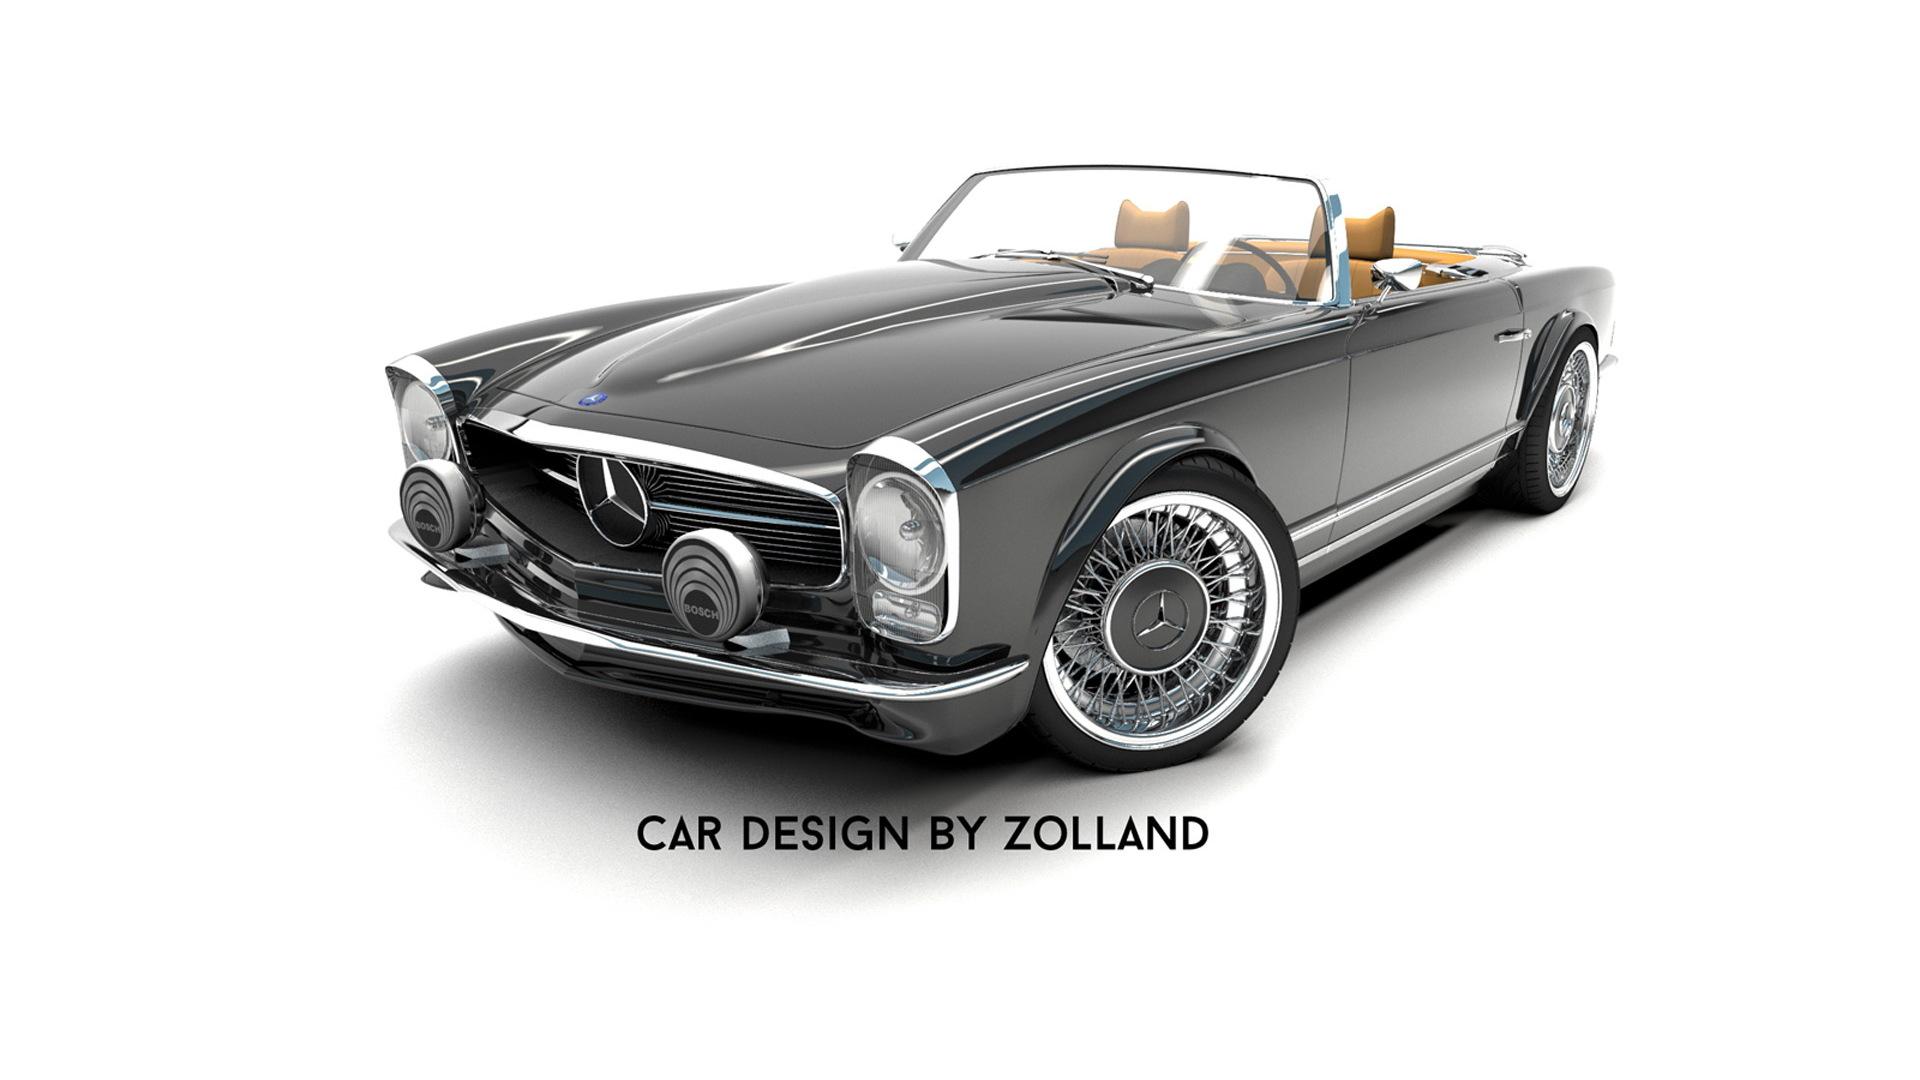 Zolland Design retro conversion for the fifth-generation Mercedes-Benz SL